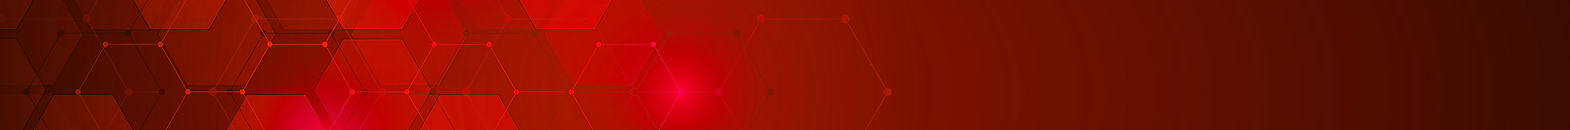 Red_fessar_Bar.jpg